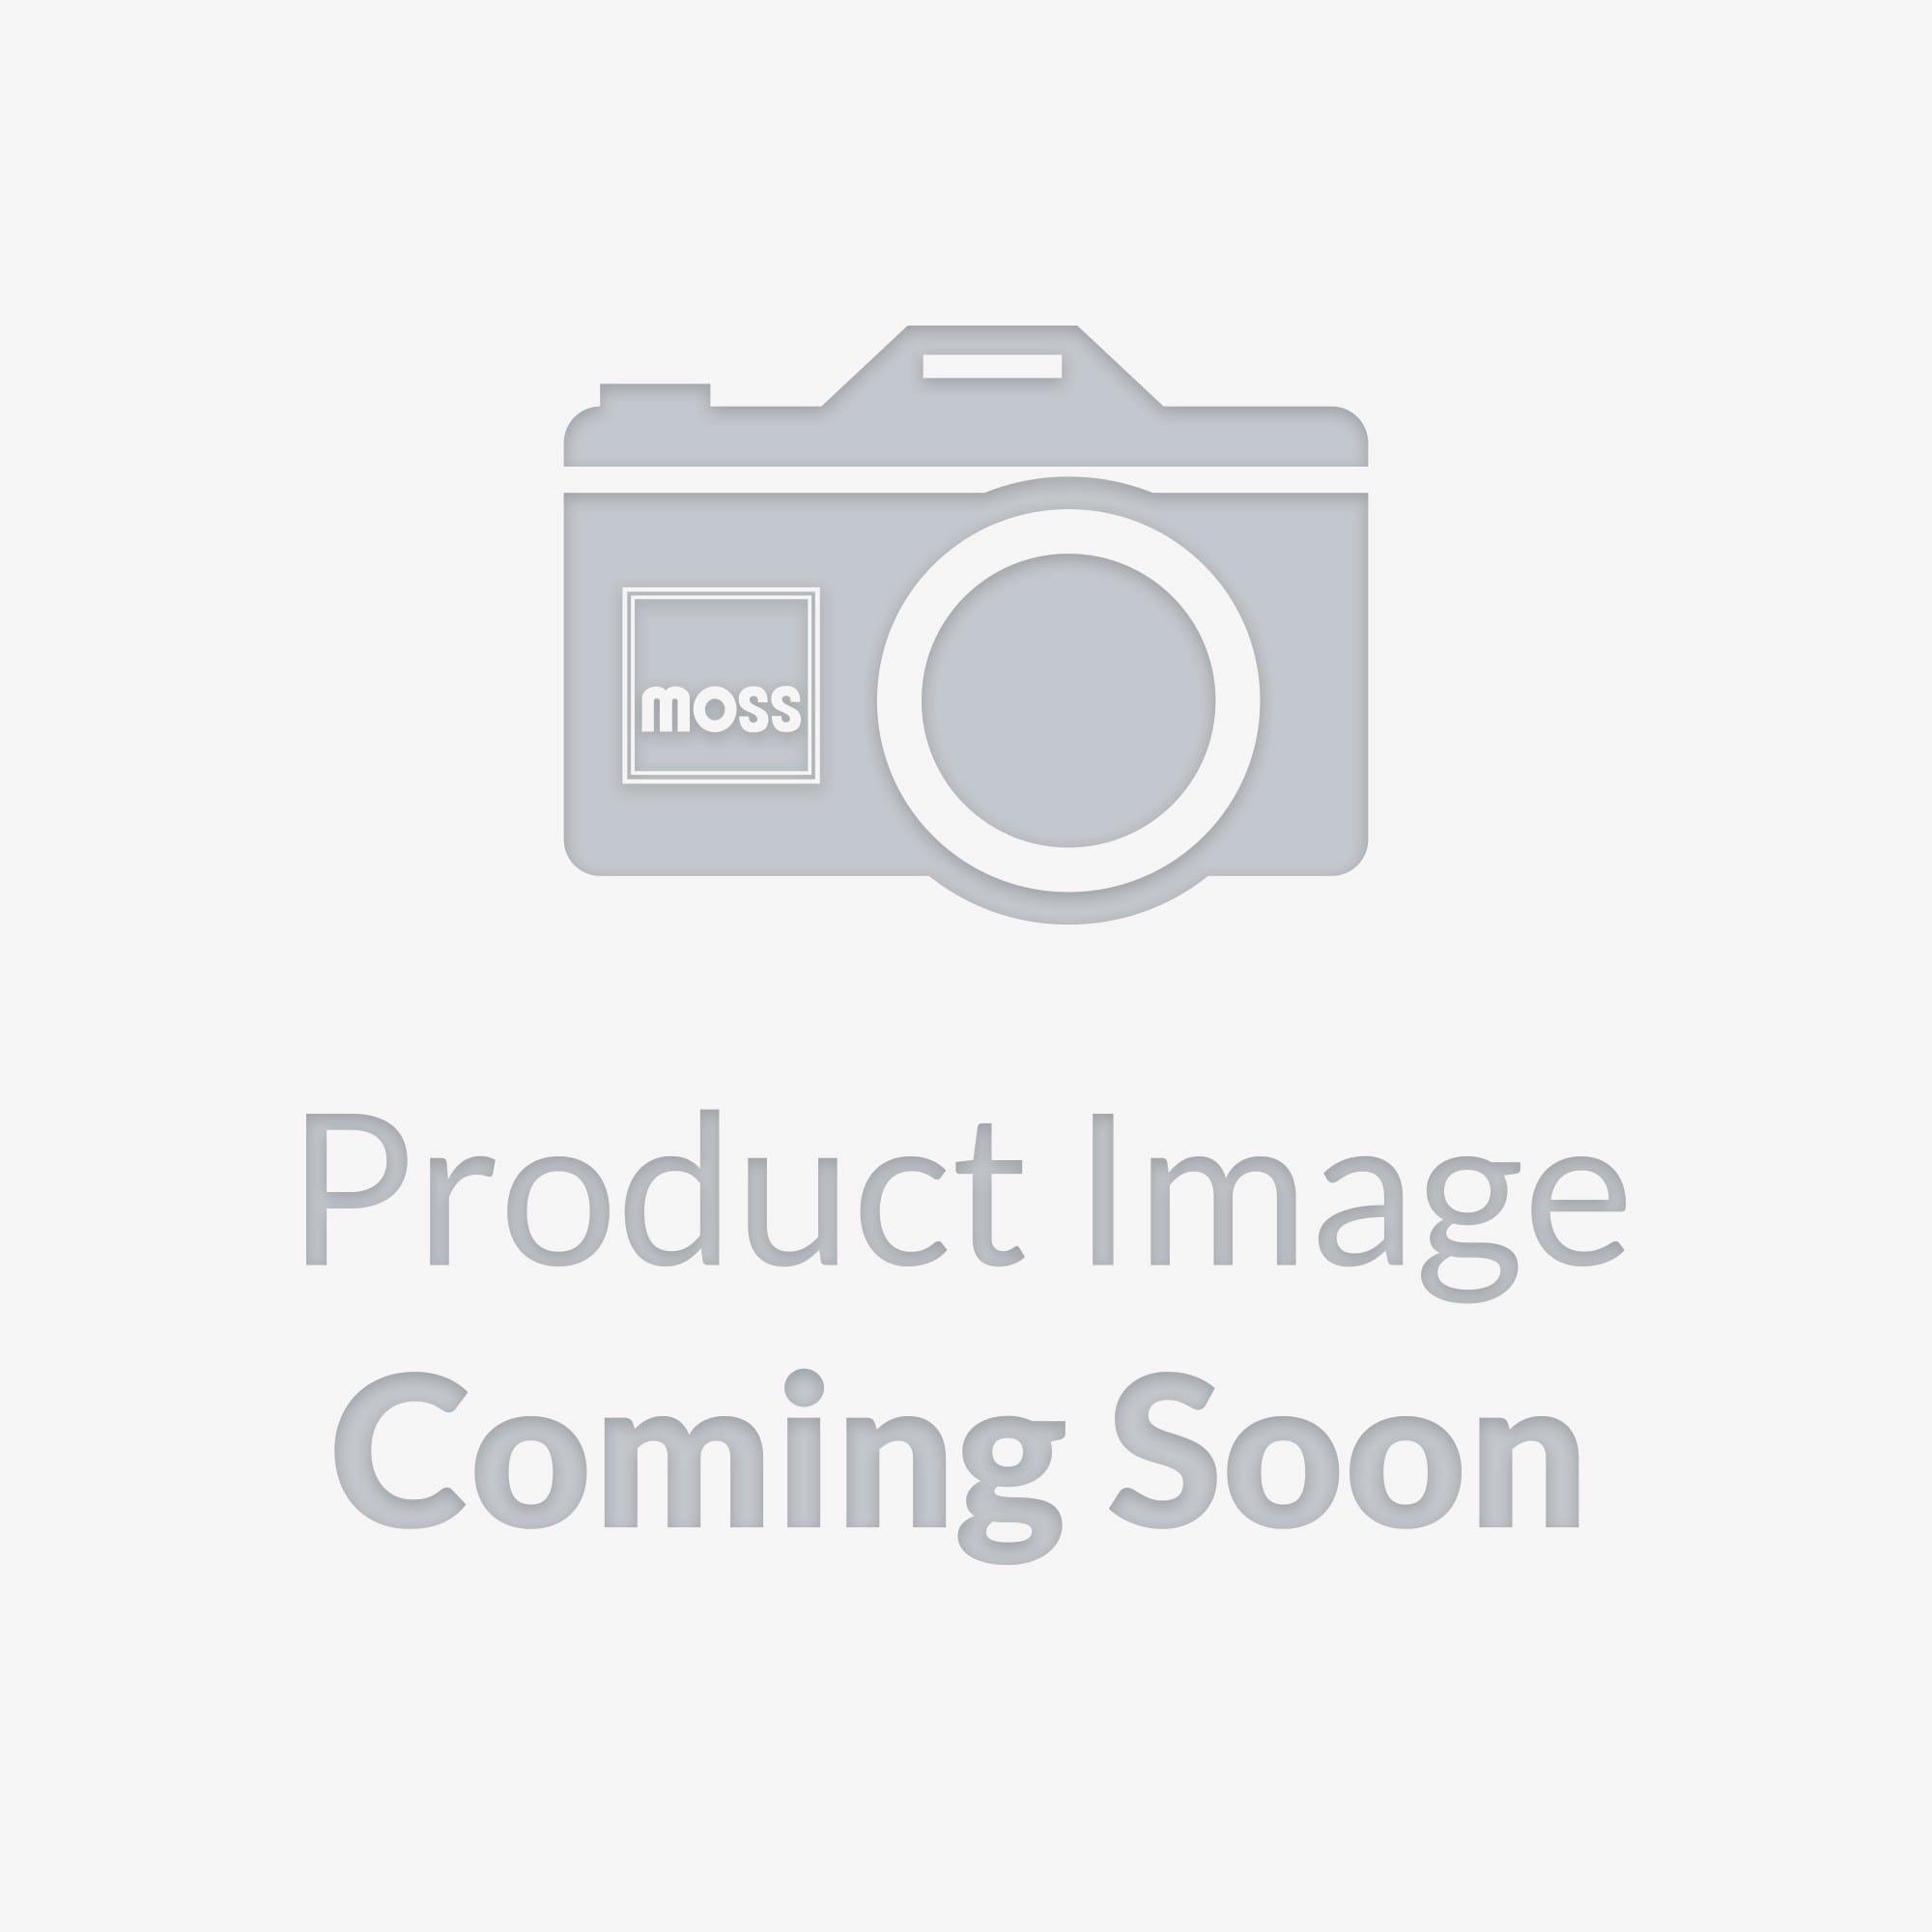 130 058 Alternator Conversion Kit Moss Motors Lucas Wiring Diagram For Mg